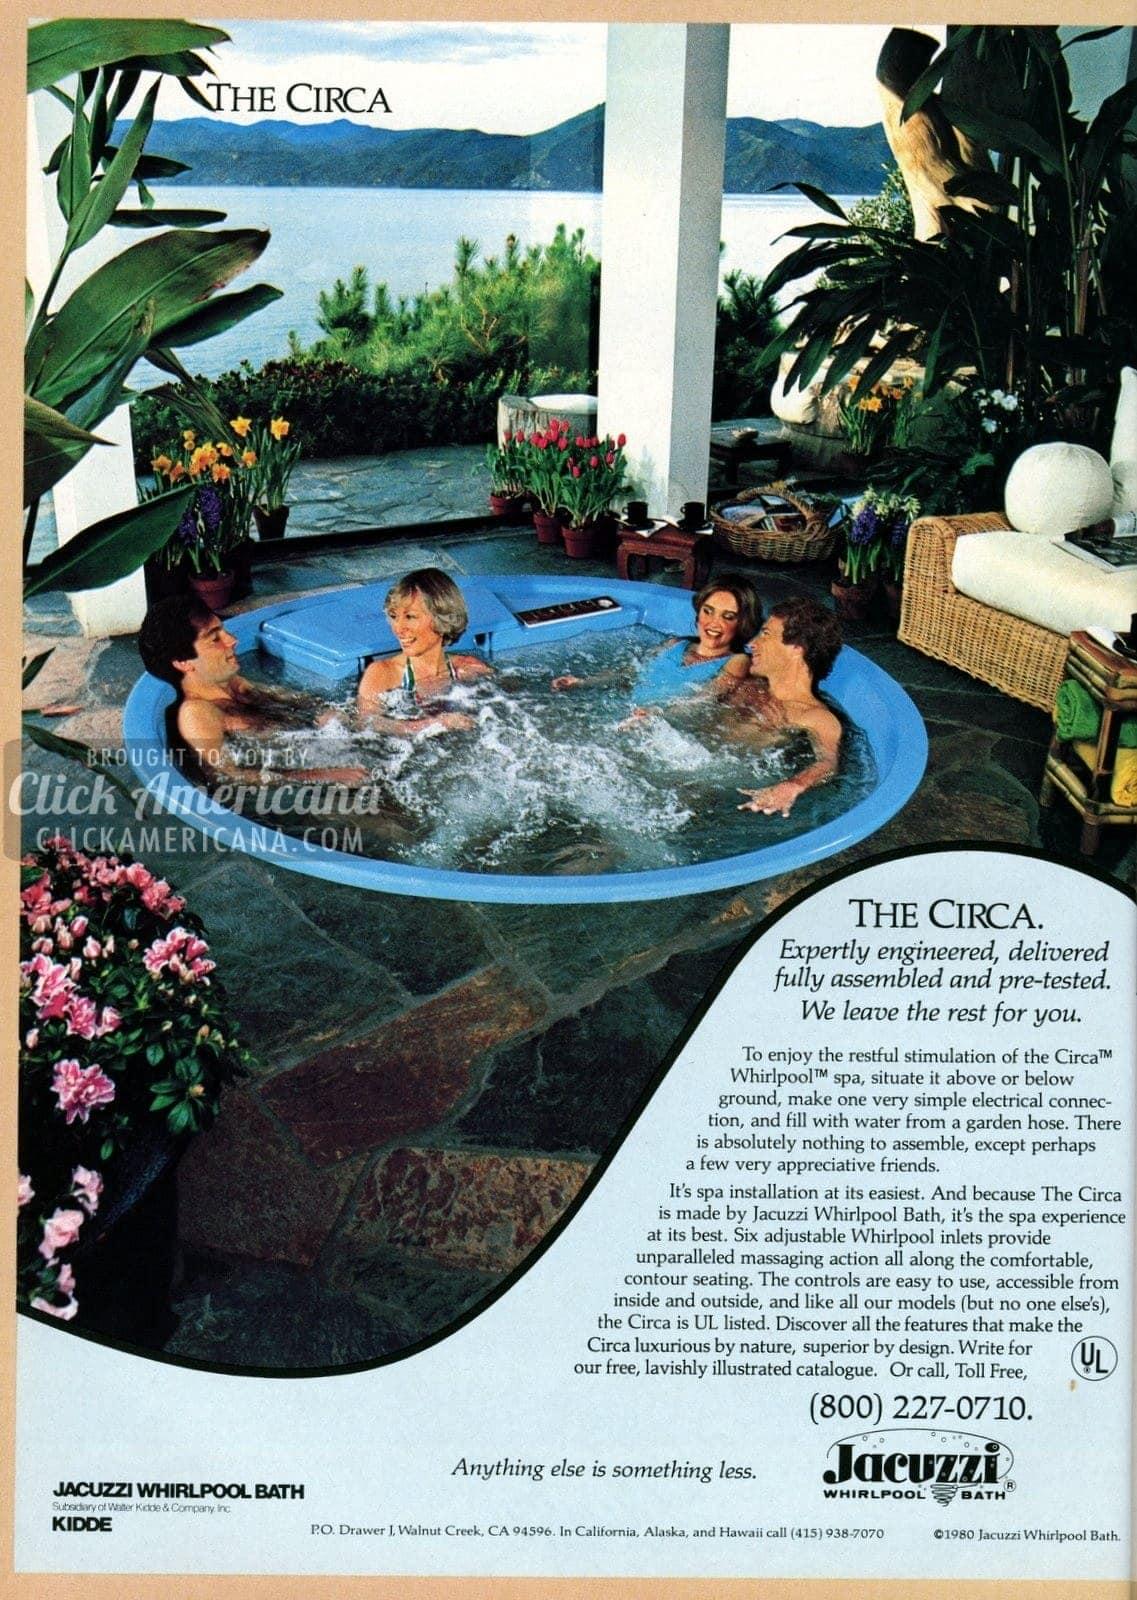 Backyard spa: Circa hot tub from Jacuzzi (1981)